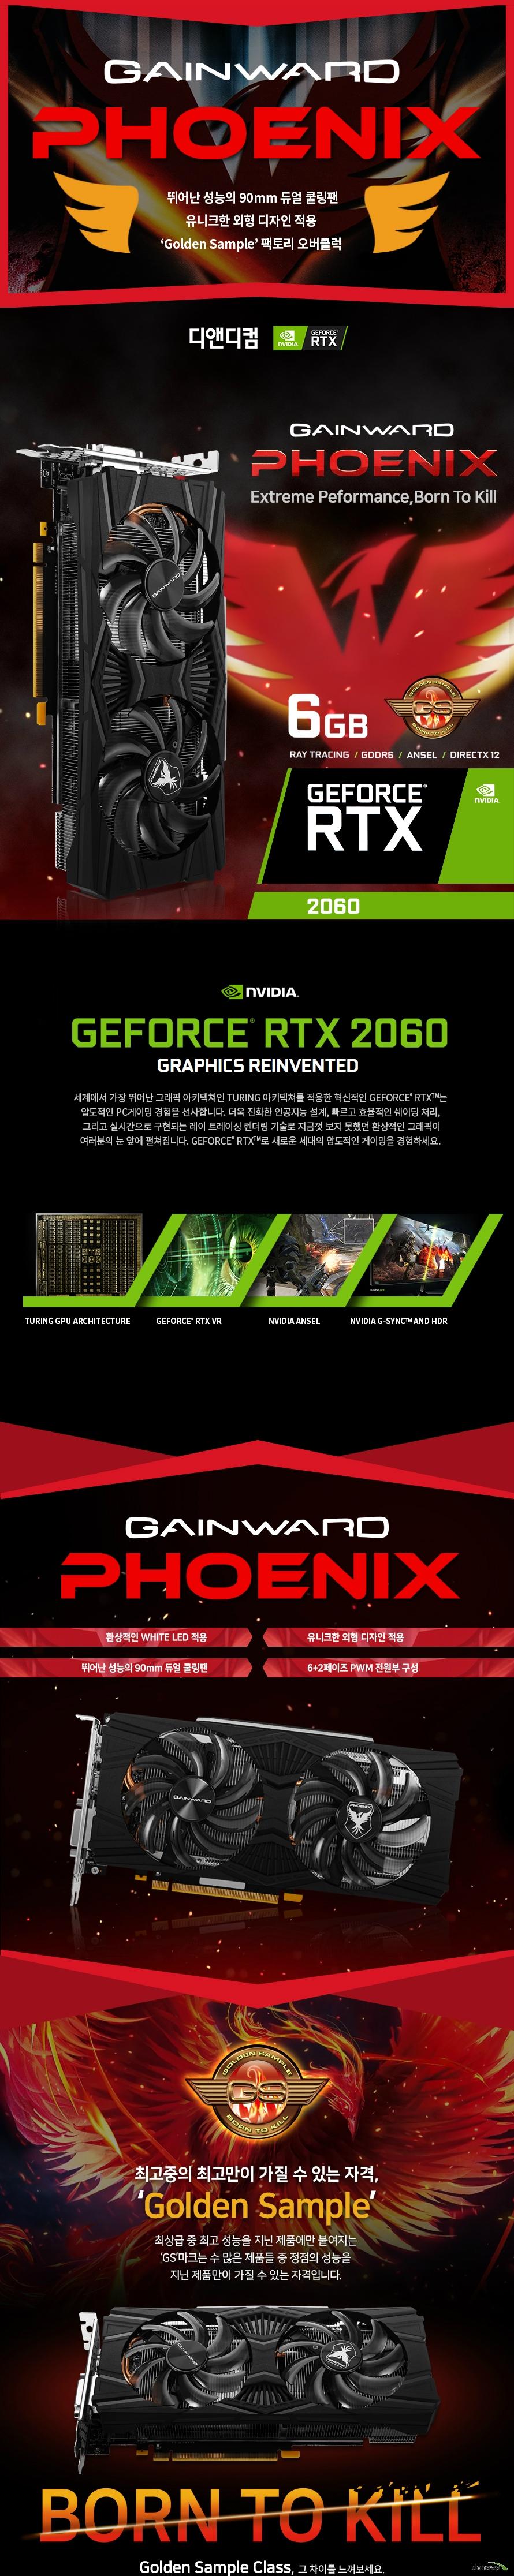 GAINWARD 지포스 RTX 2060 피닉스 GS D6 6GB 디앤디컴  제품 크기      길이 235밀리미터     높이 112밀리미터     두께 38 밀리미터          제품 상세정보          GPU 엔진 사양          프로세서 코어 1920개     베이스 클럭 1365메가헤르츠     부스트 클럭 1830메가헤르츠          메모리 사양          메모리 속도 14000메가헤르츠     메모리 용량 6기가바이트     메모리 인터페이스 GDDR6 192비트          디스플레이 출력 정보          모니터 동시 지원 최대 4대     최대 해상도 7680 4320     출력 포트 DP1.4 포트 1개 HDMI 2.0포트 1개 USB TYPE C 포트 1개          제품 전력 사양          그래픽카드 소모 전력 190와트     최소 시스템 요구 전력 500와트     전원 커넥터 8핀           제품 추가 사양          제품 인증번호 R R DND GW RTX2060 PNX     품질 보증기간 3년 무상 보증       디앤디컴 3년무상 서비스          디앤디컴에서 유통하는 게인워드 지포스 gtx 제품은 3년 무상 품질 보증 서비스를 제공합니다.     디앤디컴 서비스 센터 02 702 1358